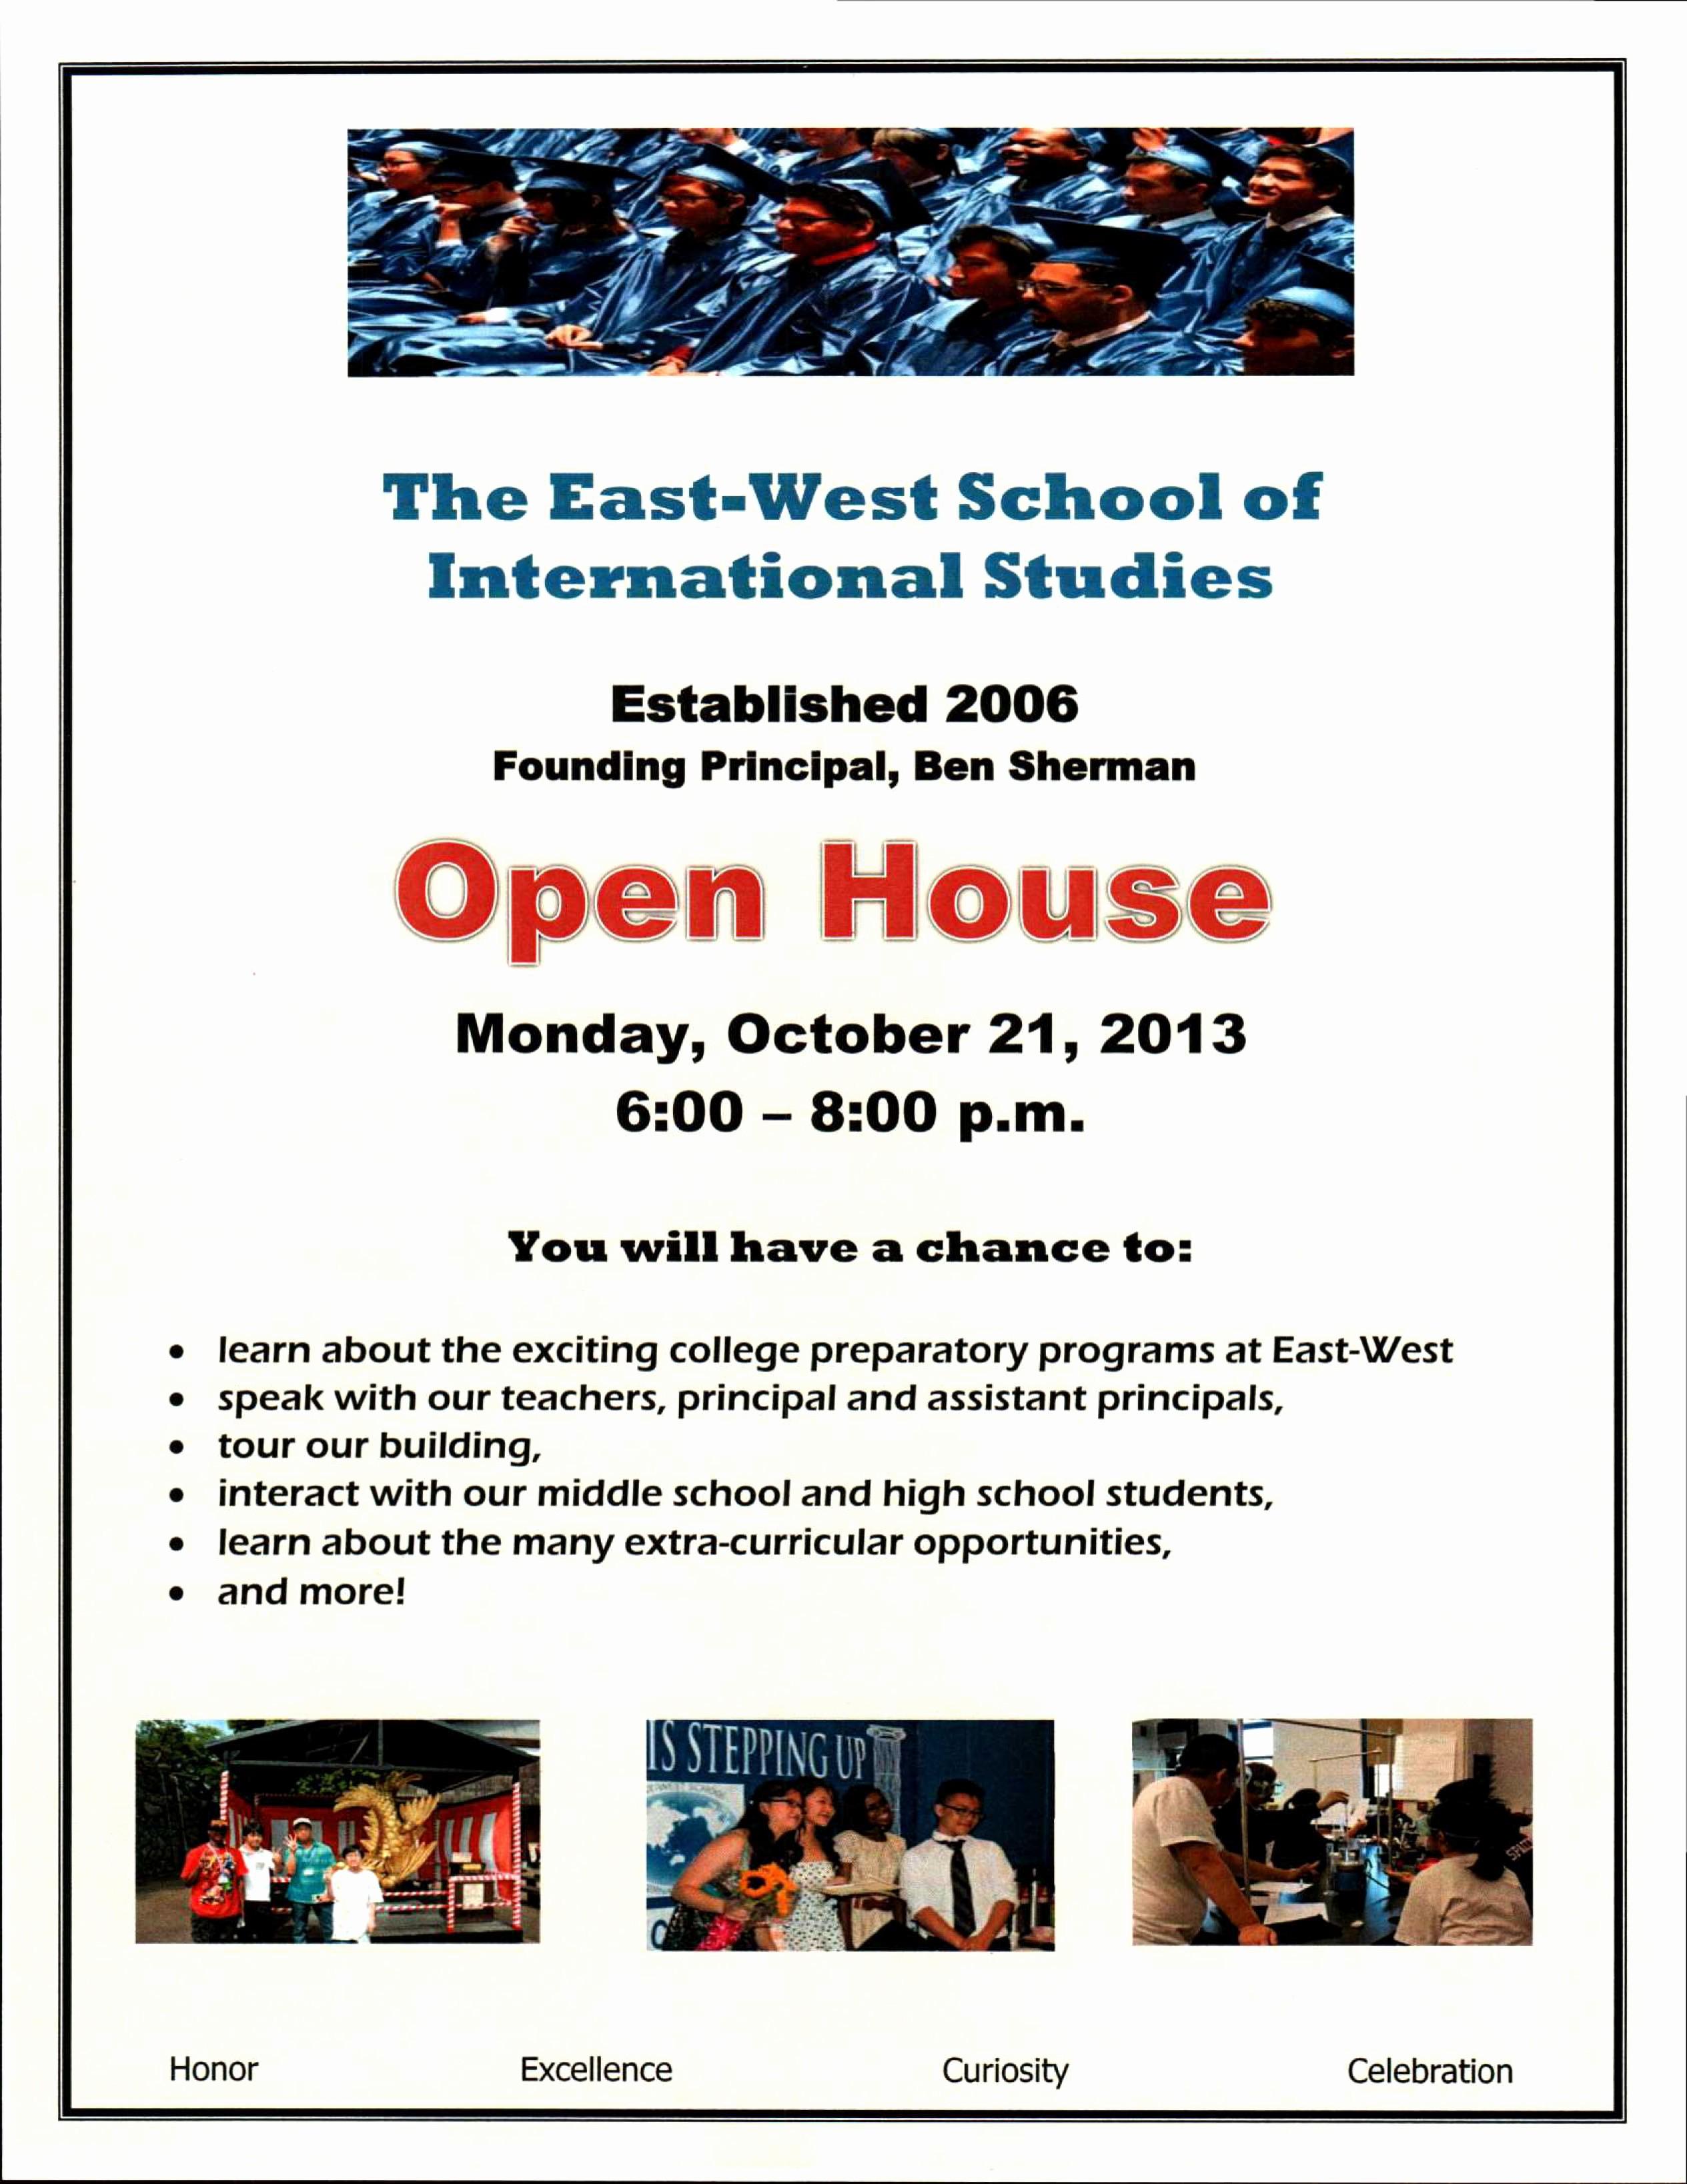 Open House Flyer for School Unique East West Open House